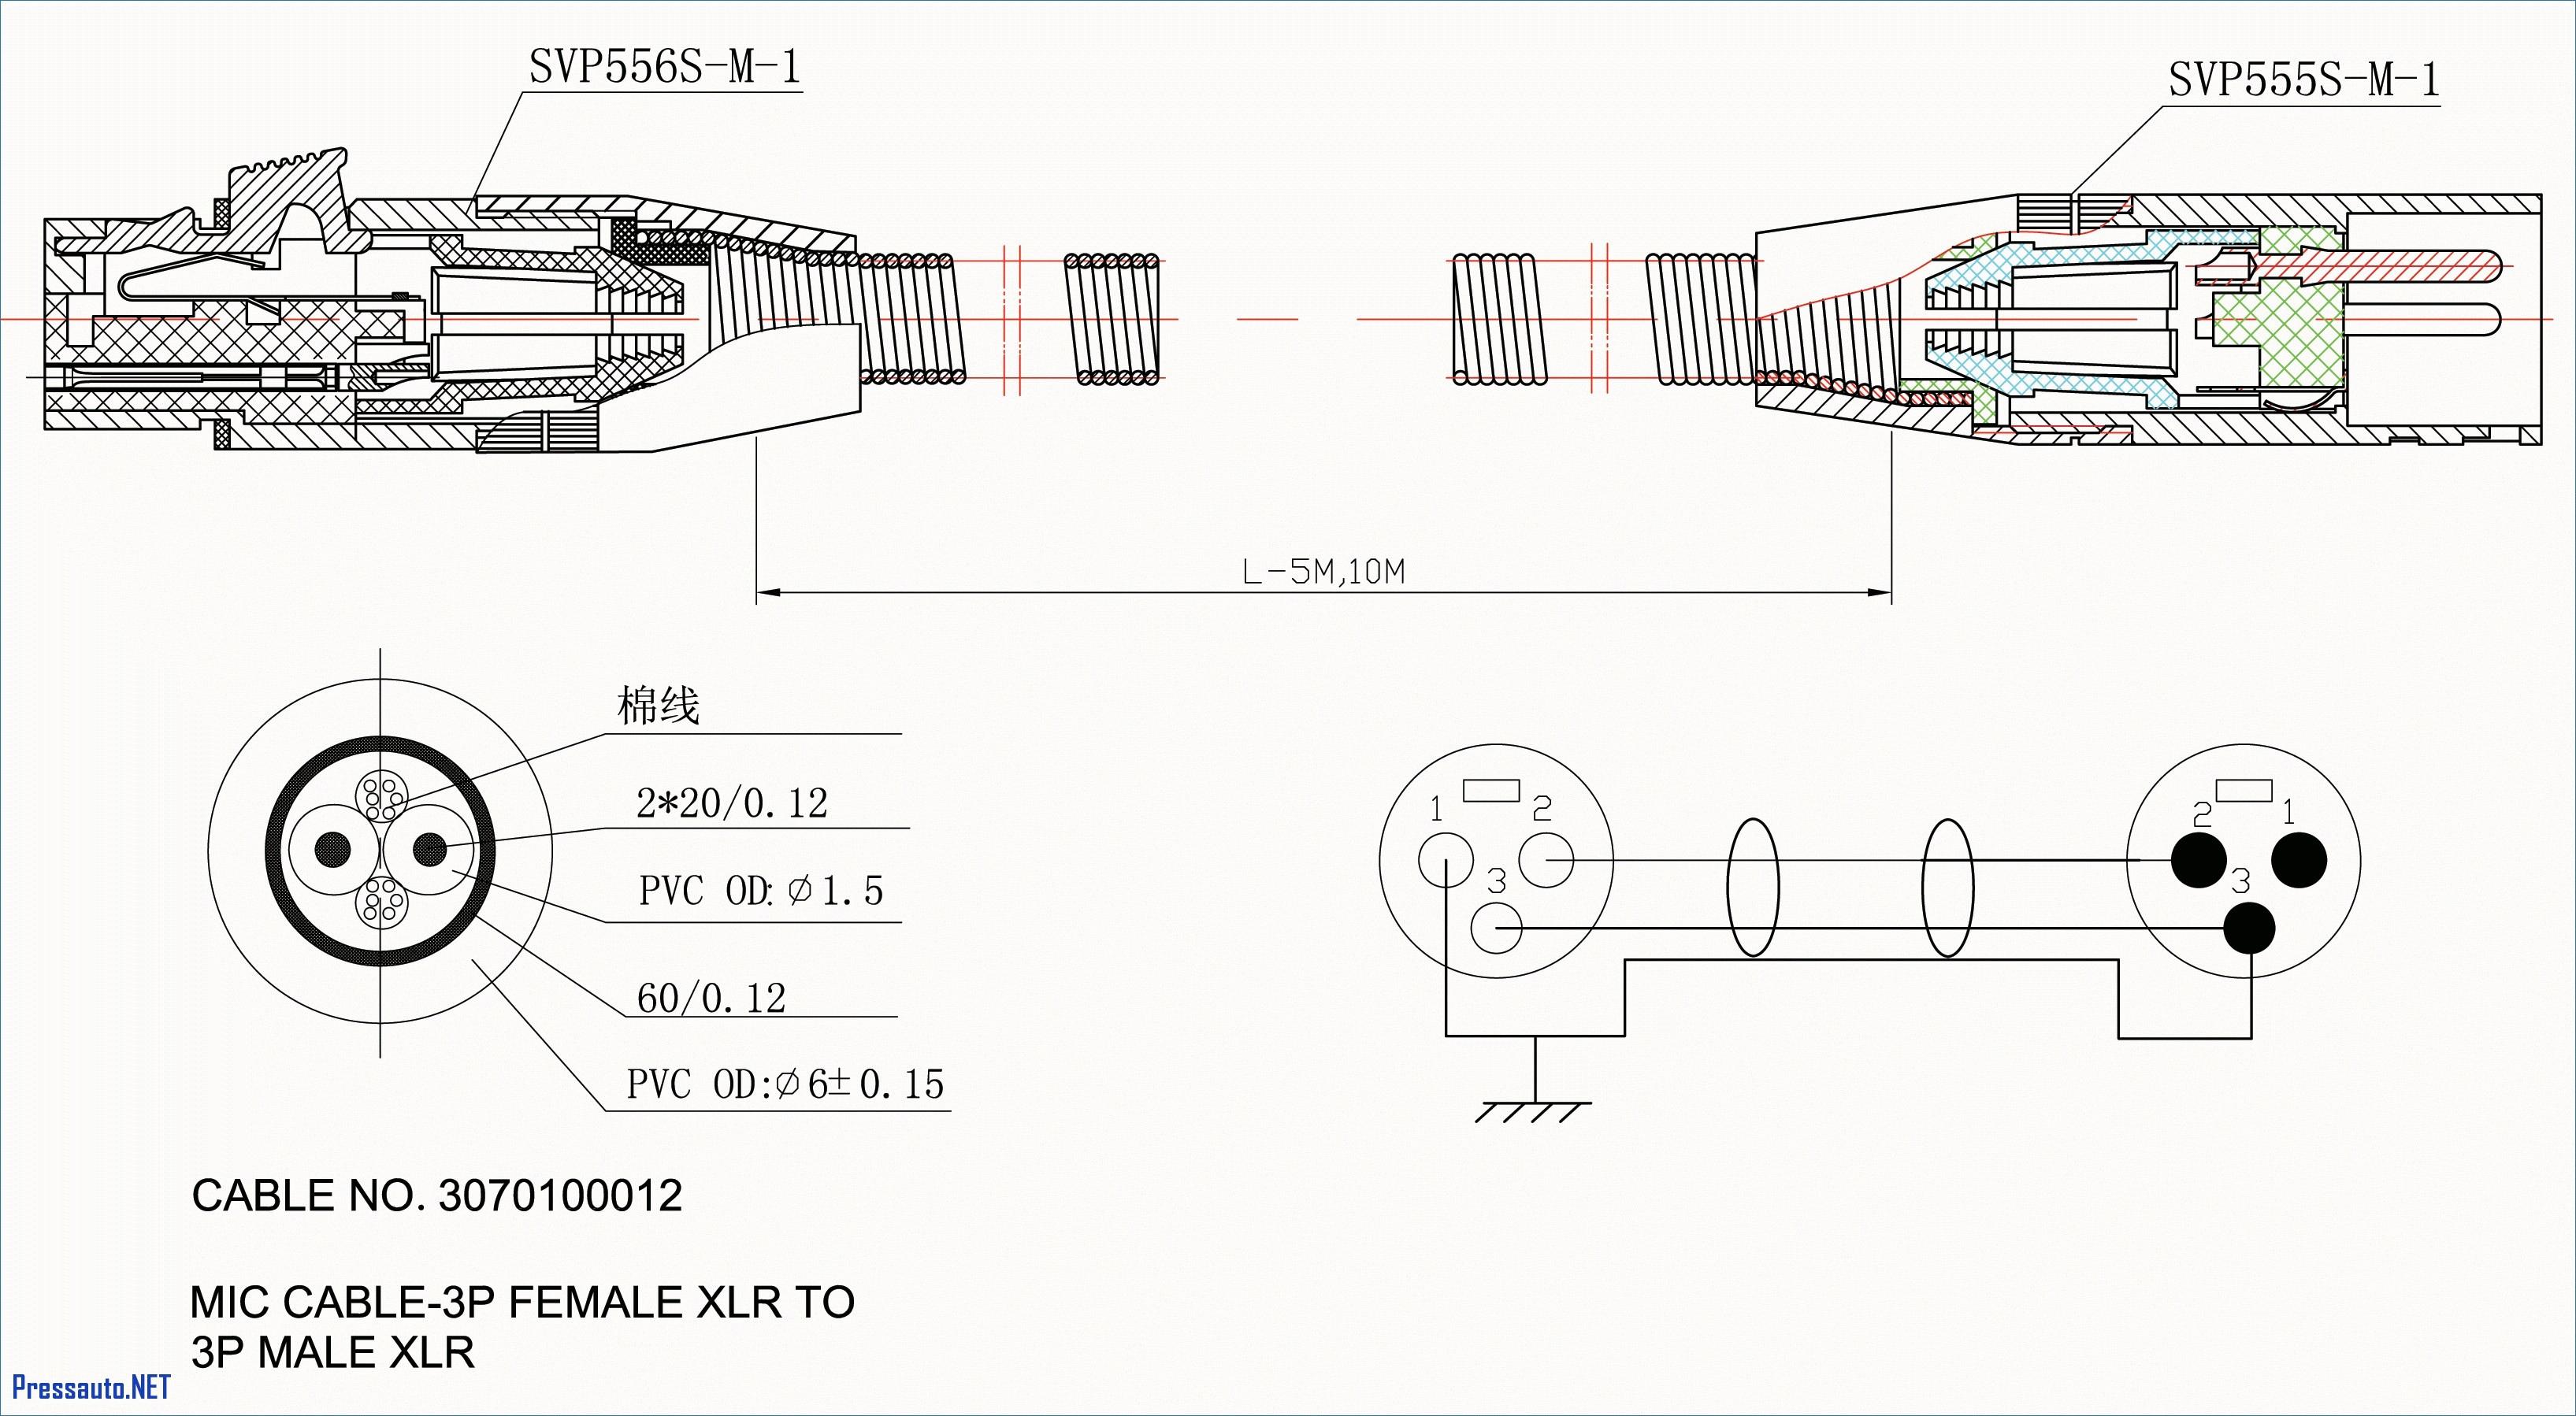 Fan Tastic Vent Wiring Diagram | Wiring Diagram - Fantastic Vent Wiring Diagram